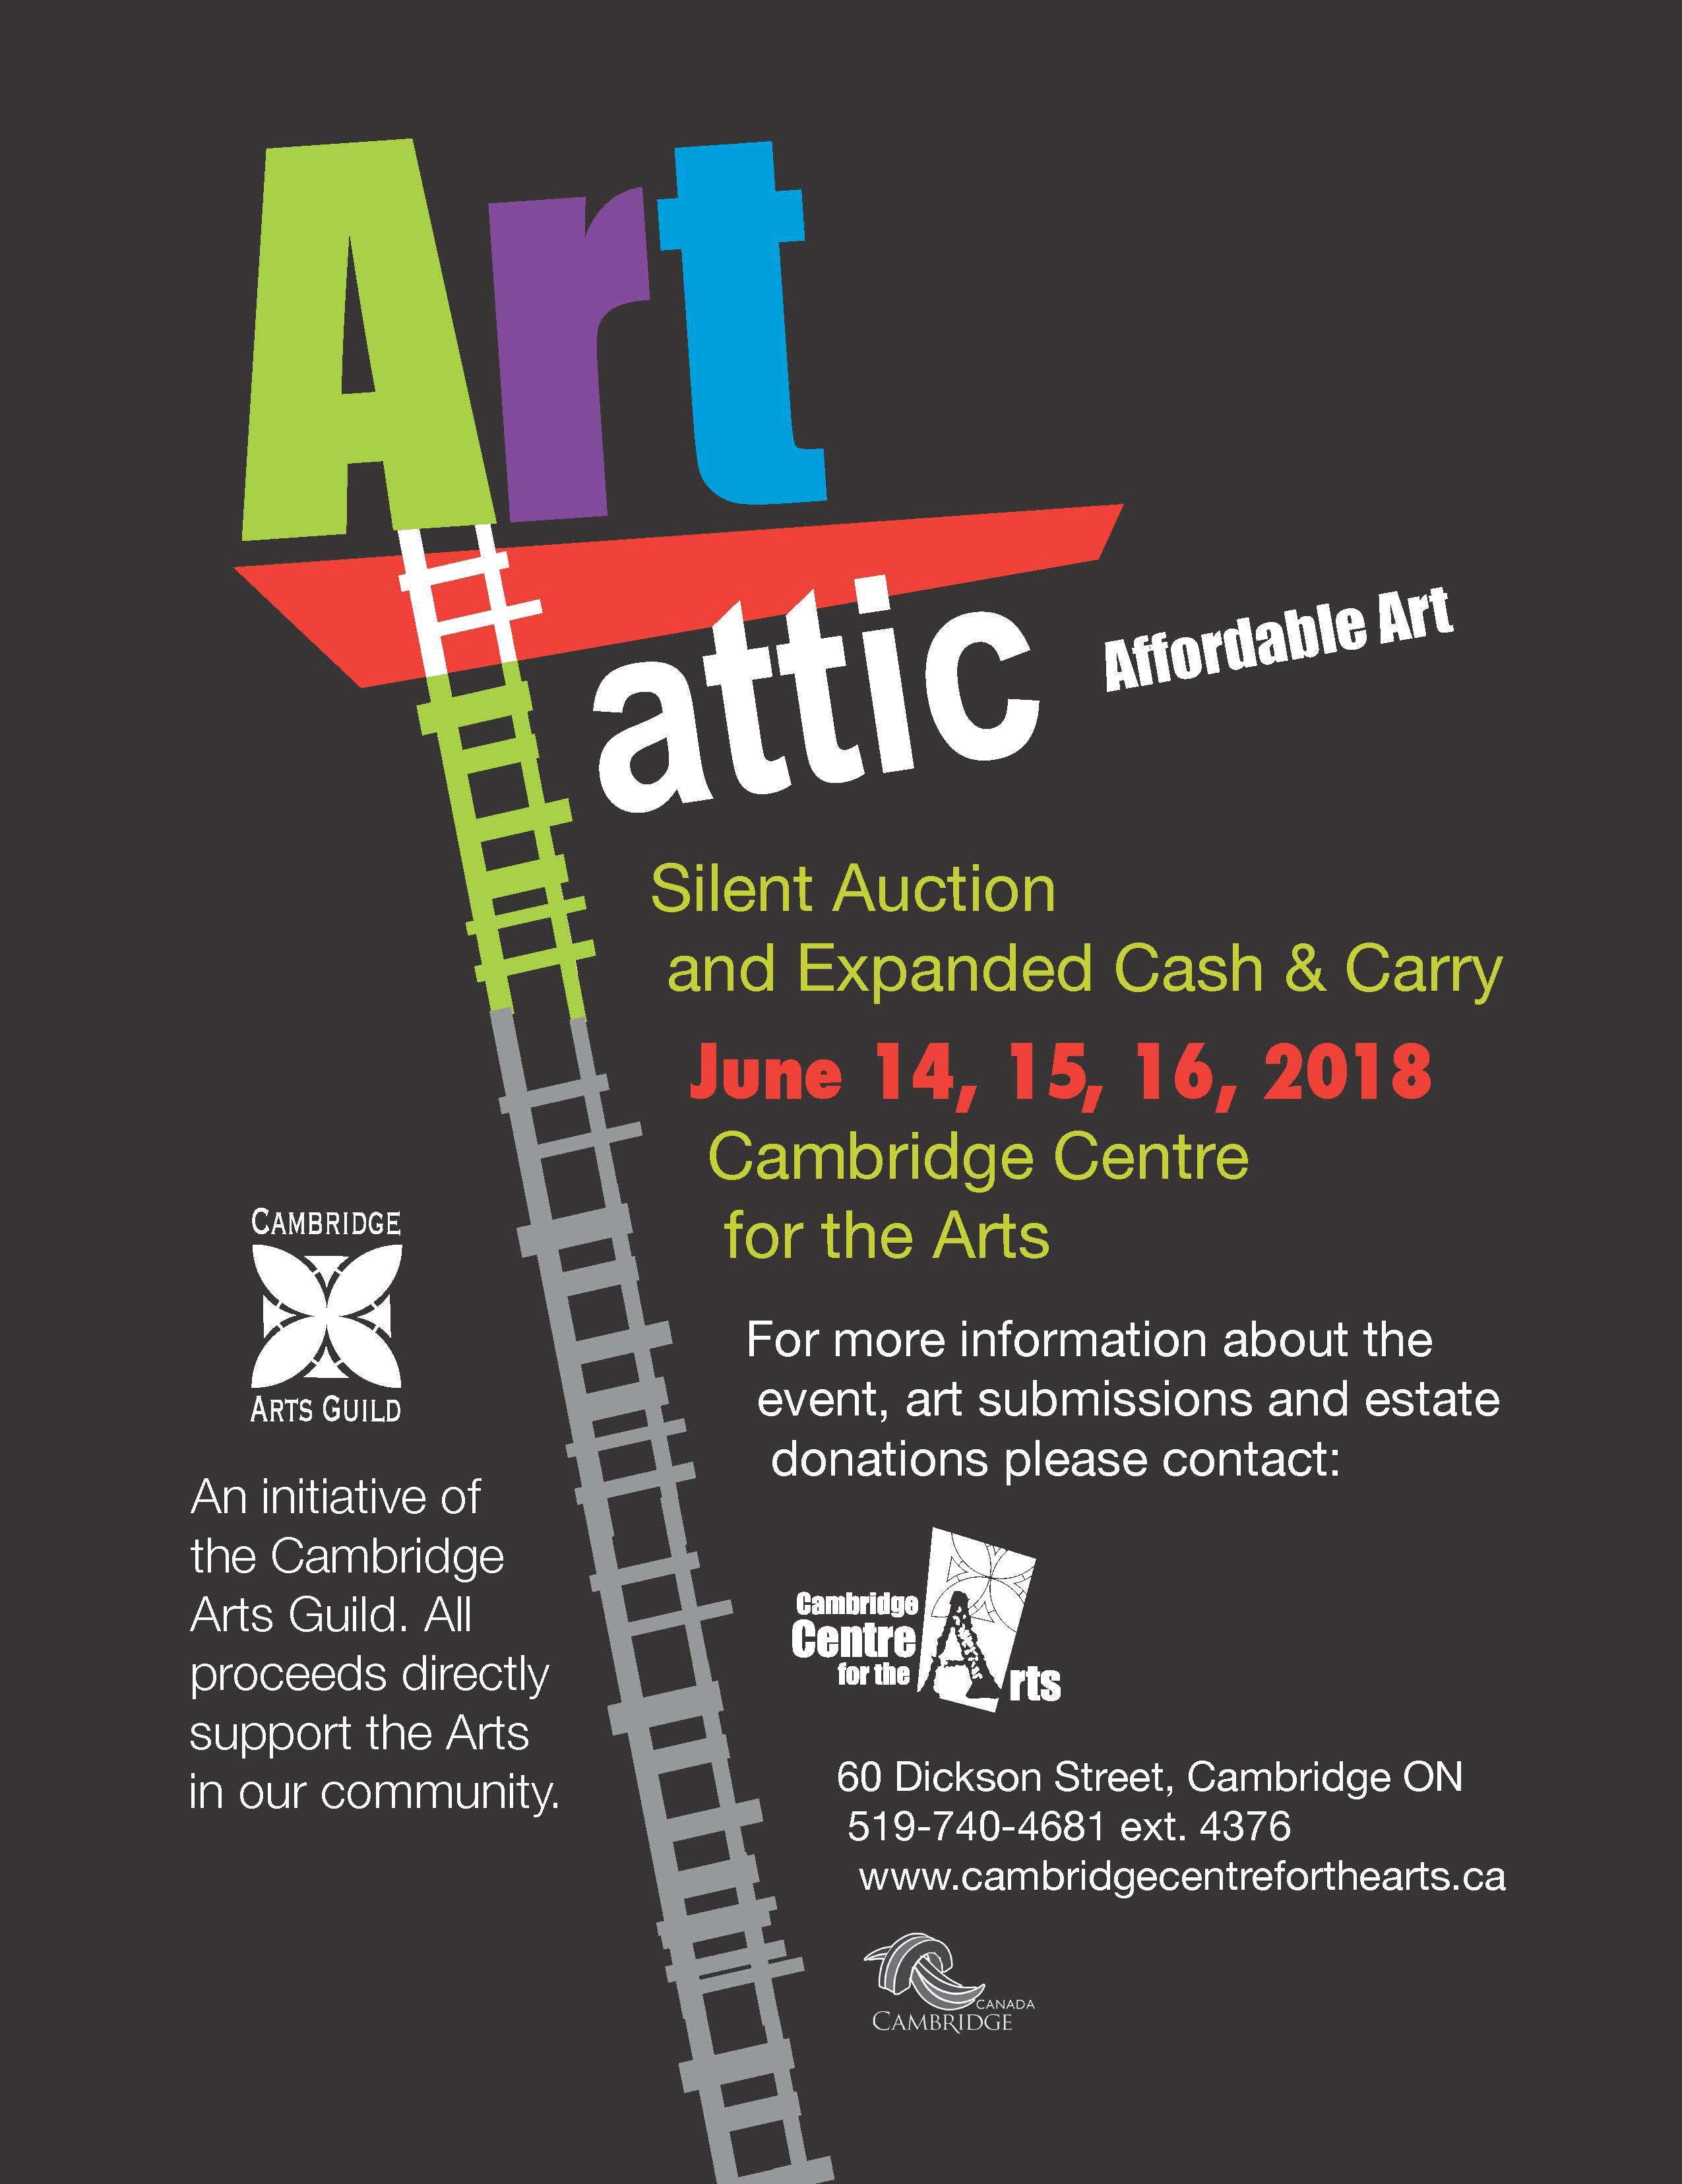 Art Attic 2018 June 14,15,16